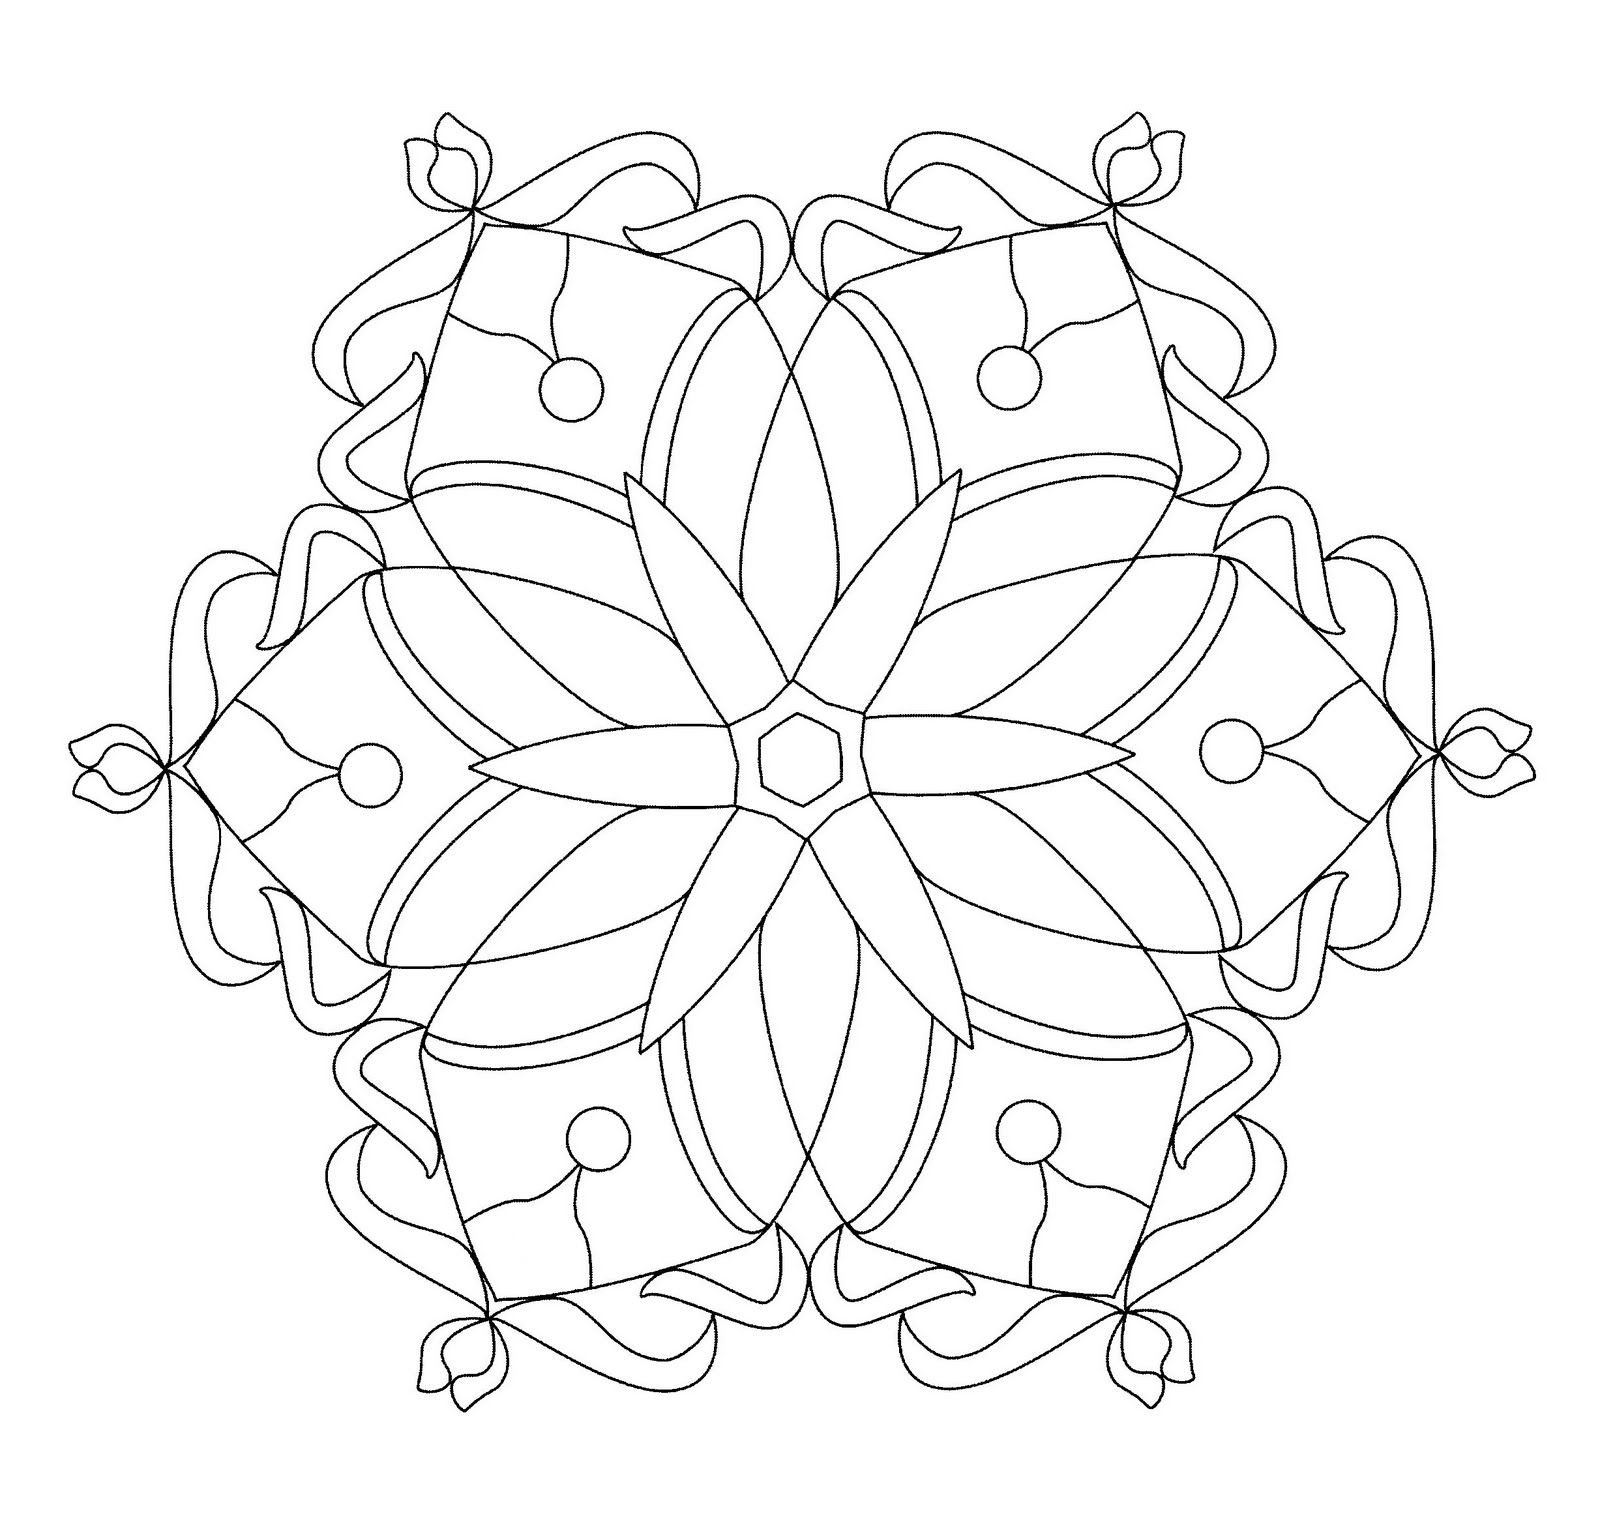 Mándalas para Colorear de Flores de Loto (14) | Mandalas | Pinterest ...